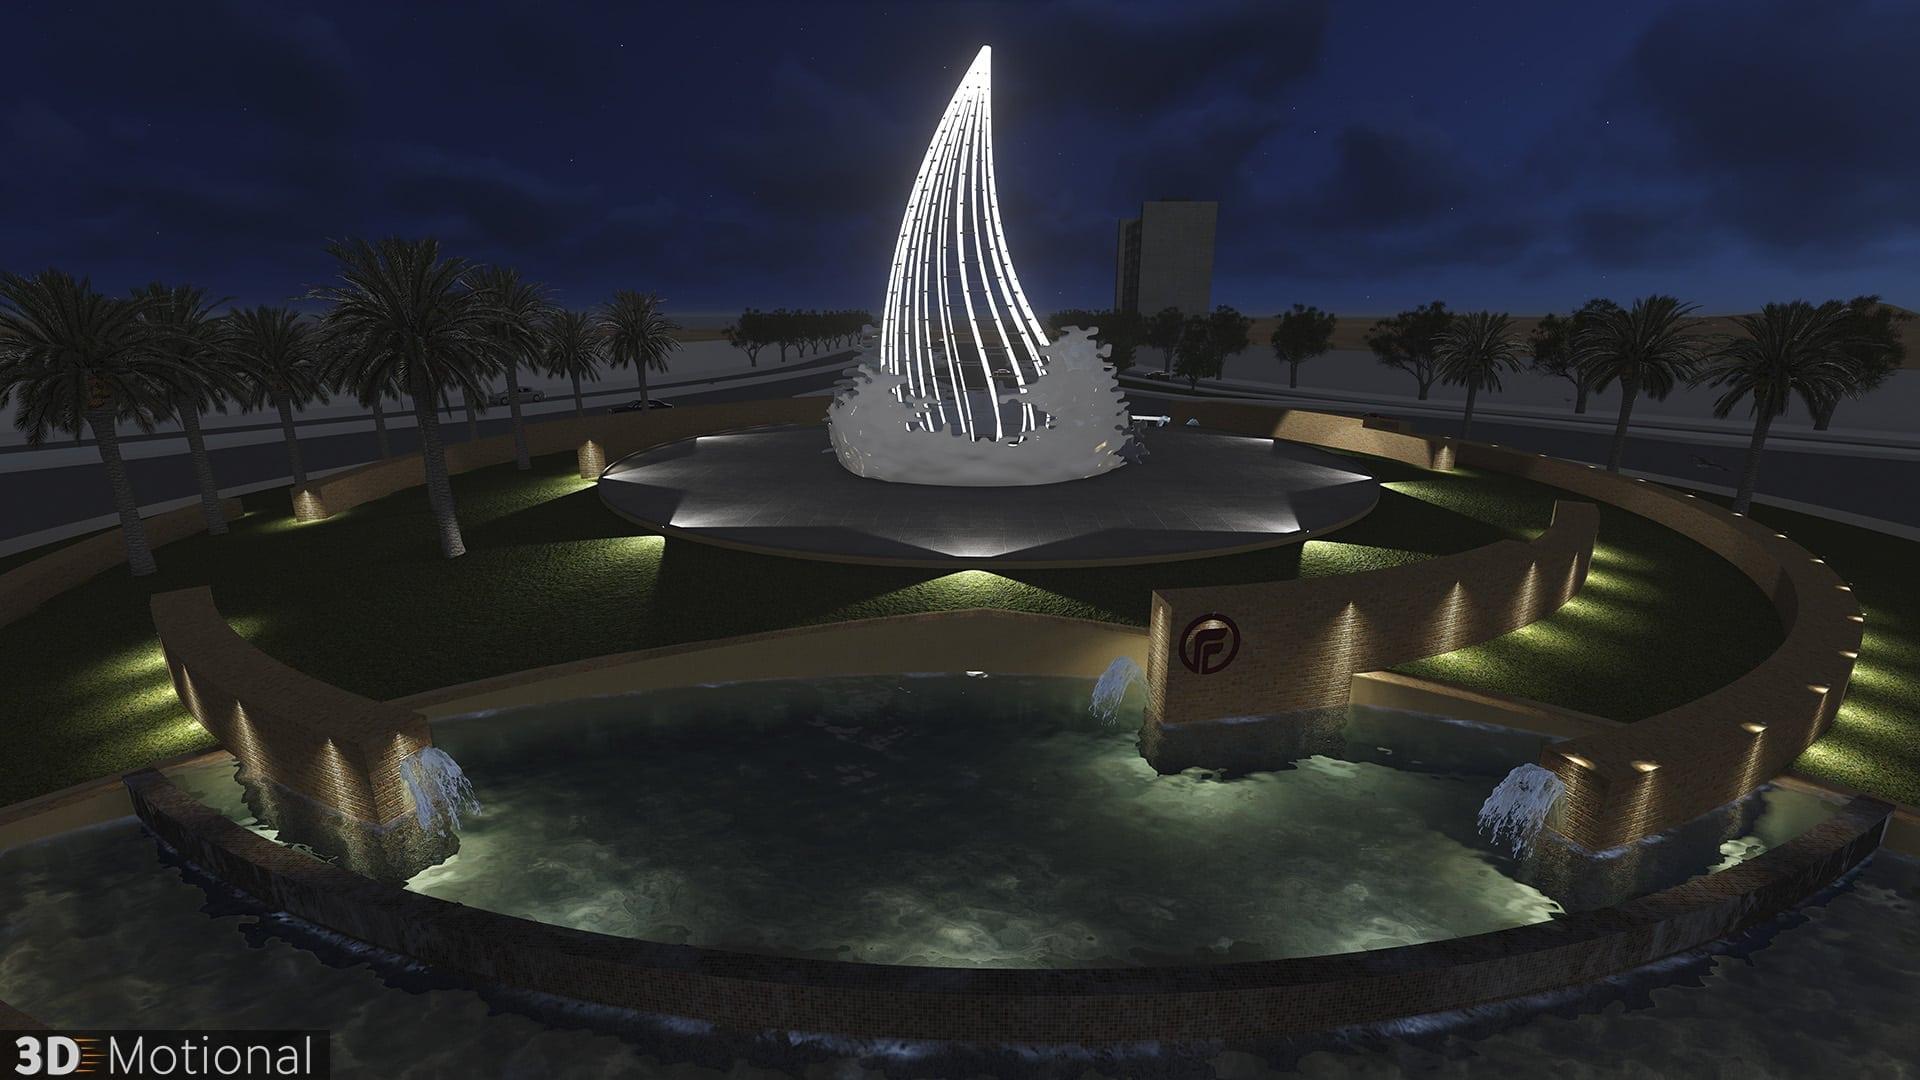 Al Fozan-Roundabout-khobar (7)